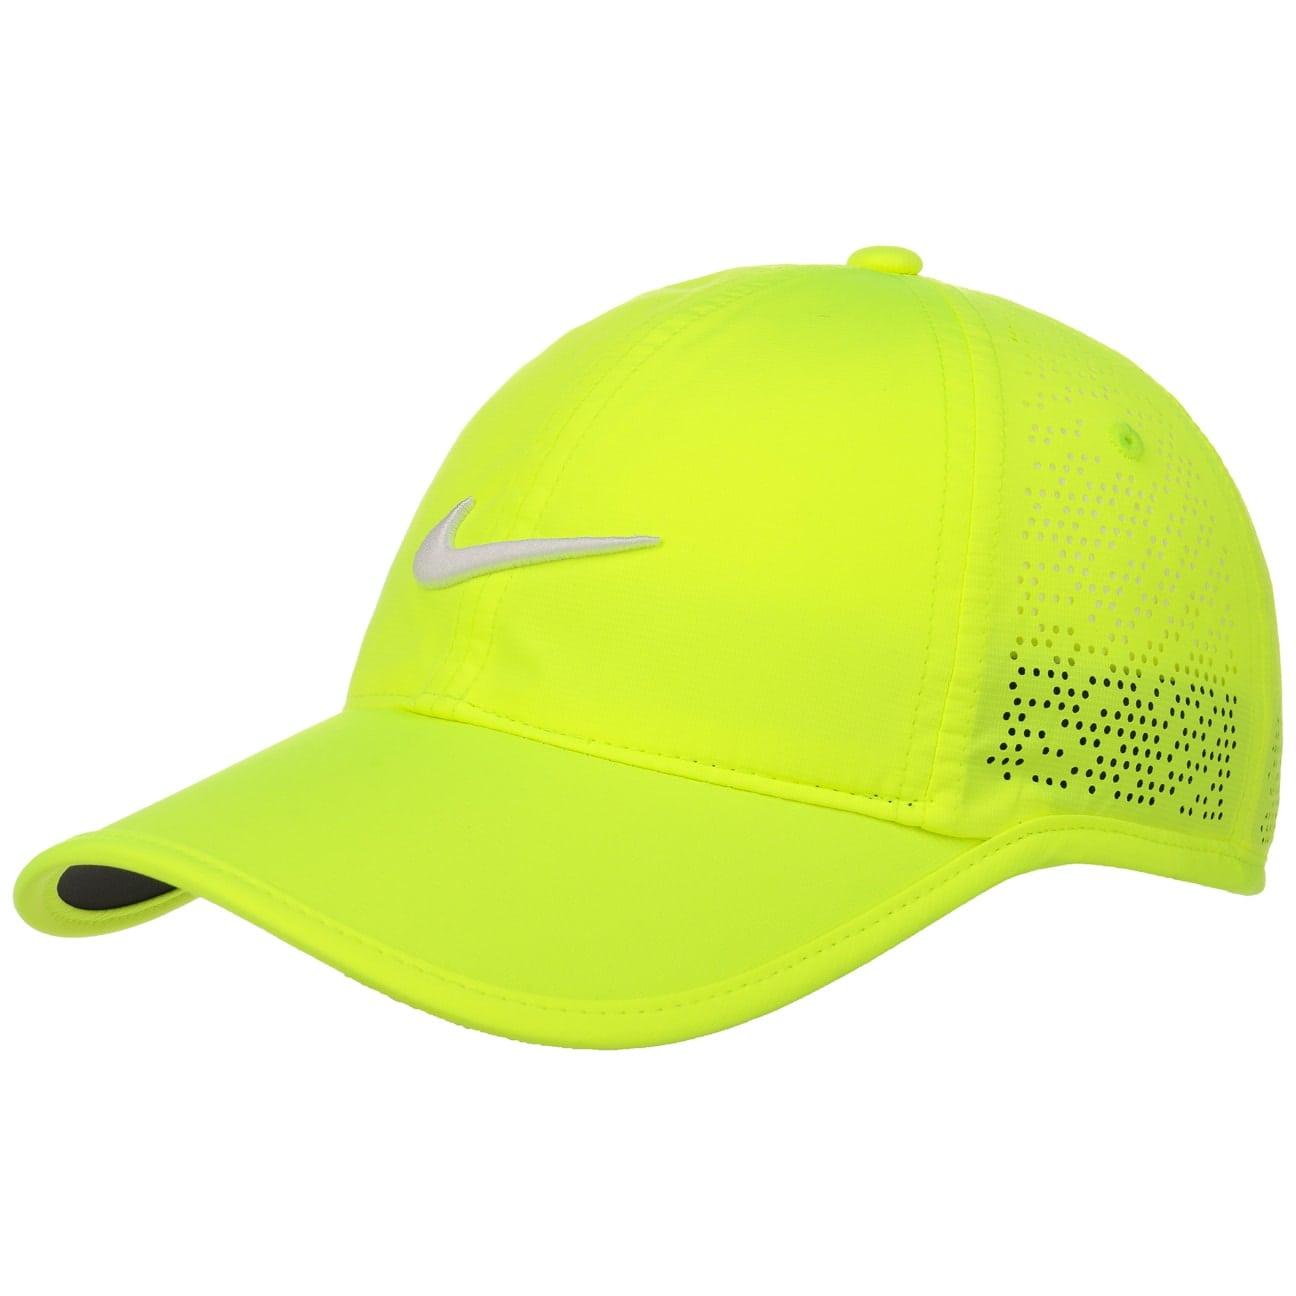 casquette-swoosh-perforation-by-nike-baseball-cap, 29.95 EUR @ chapeaushop-fr